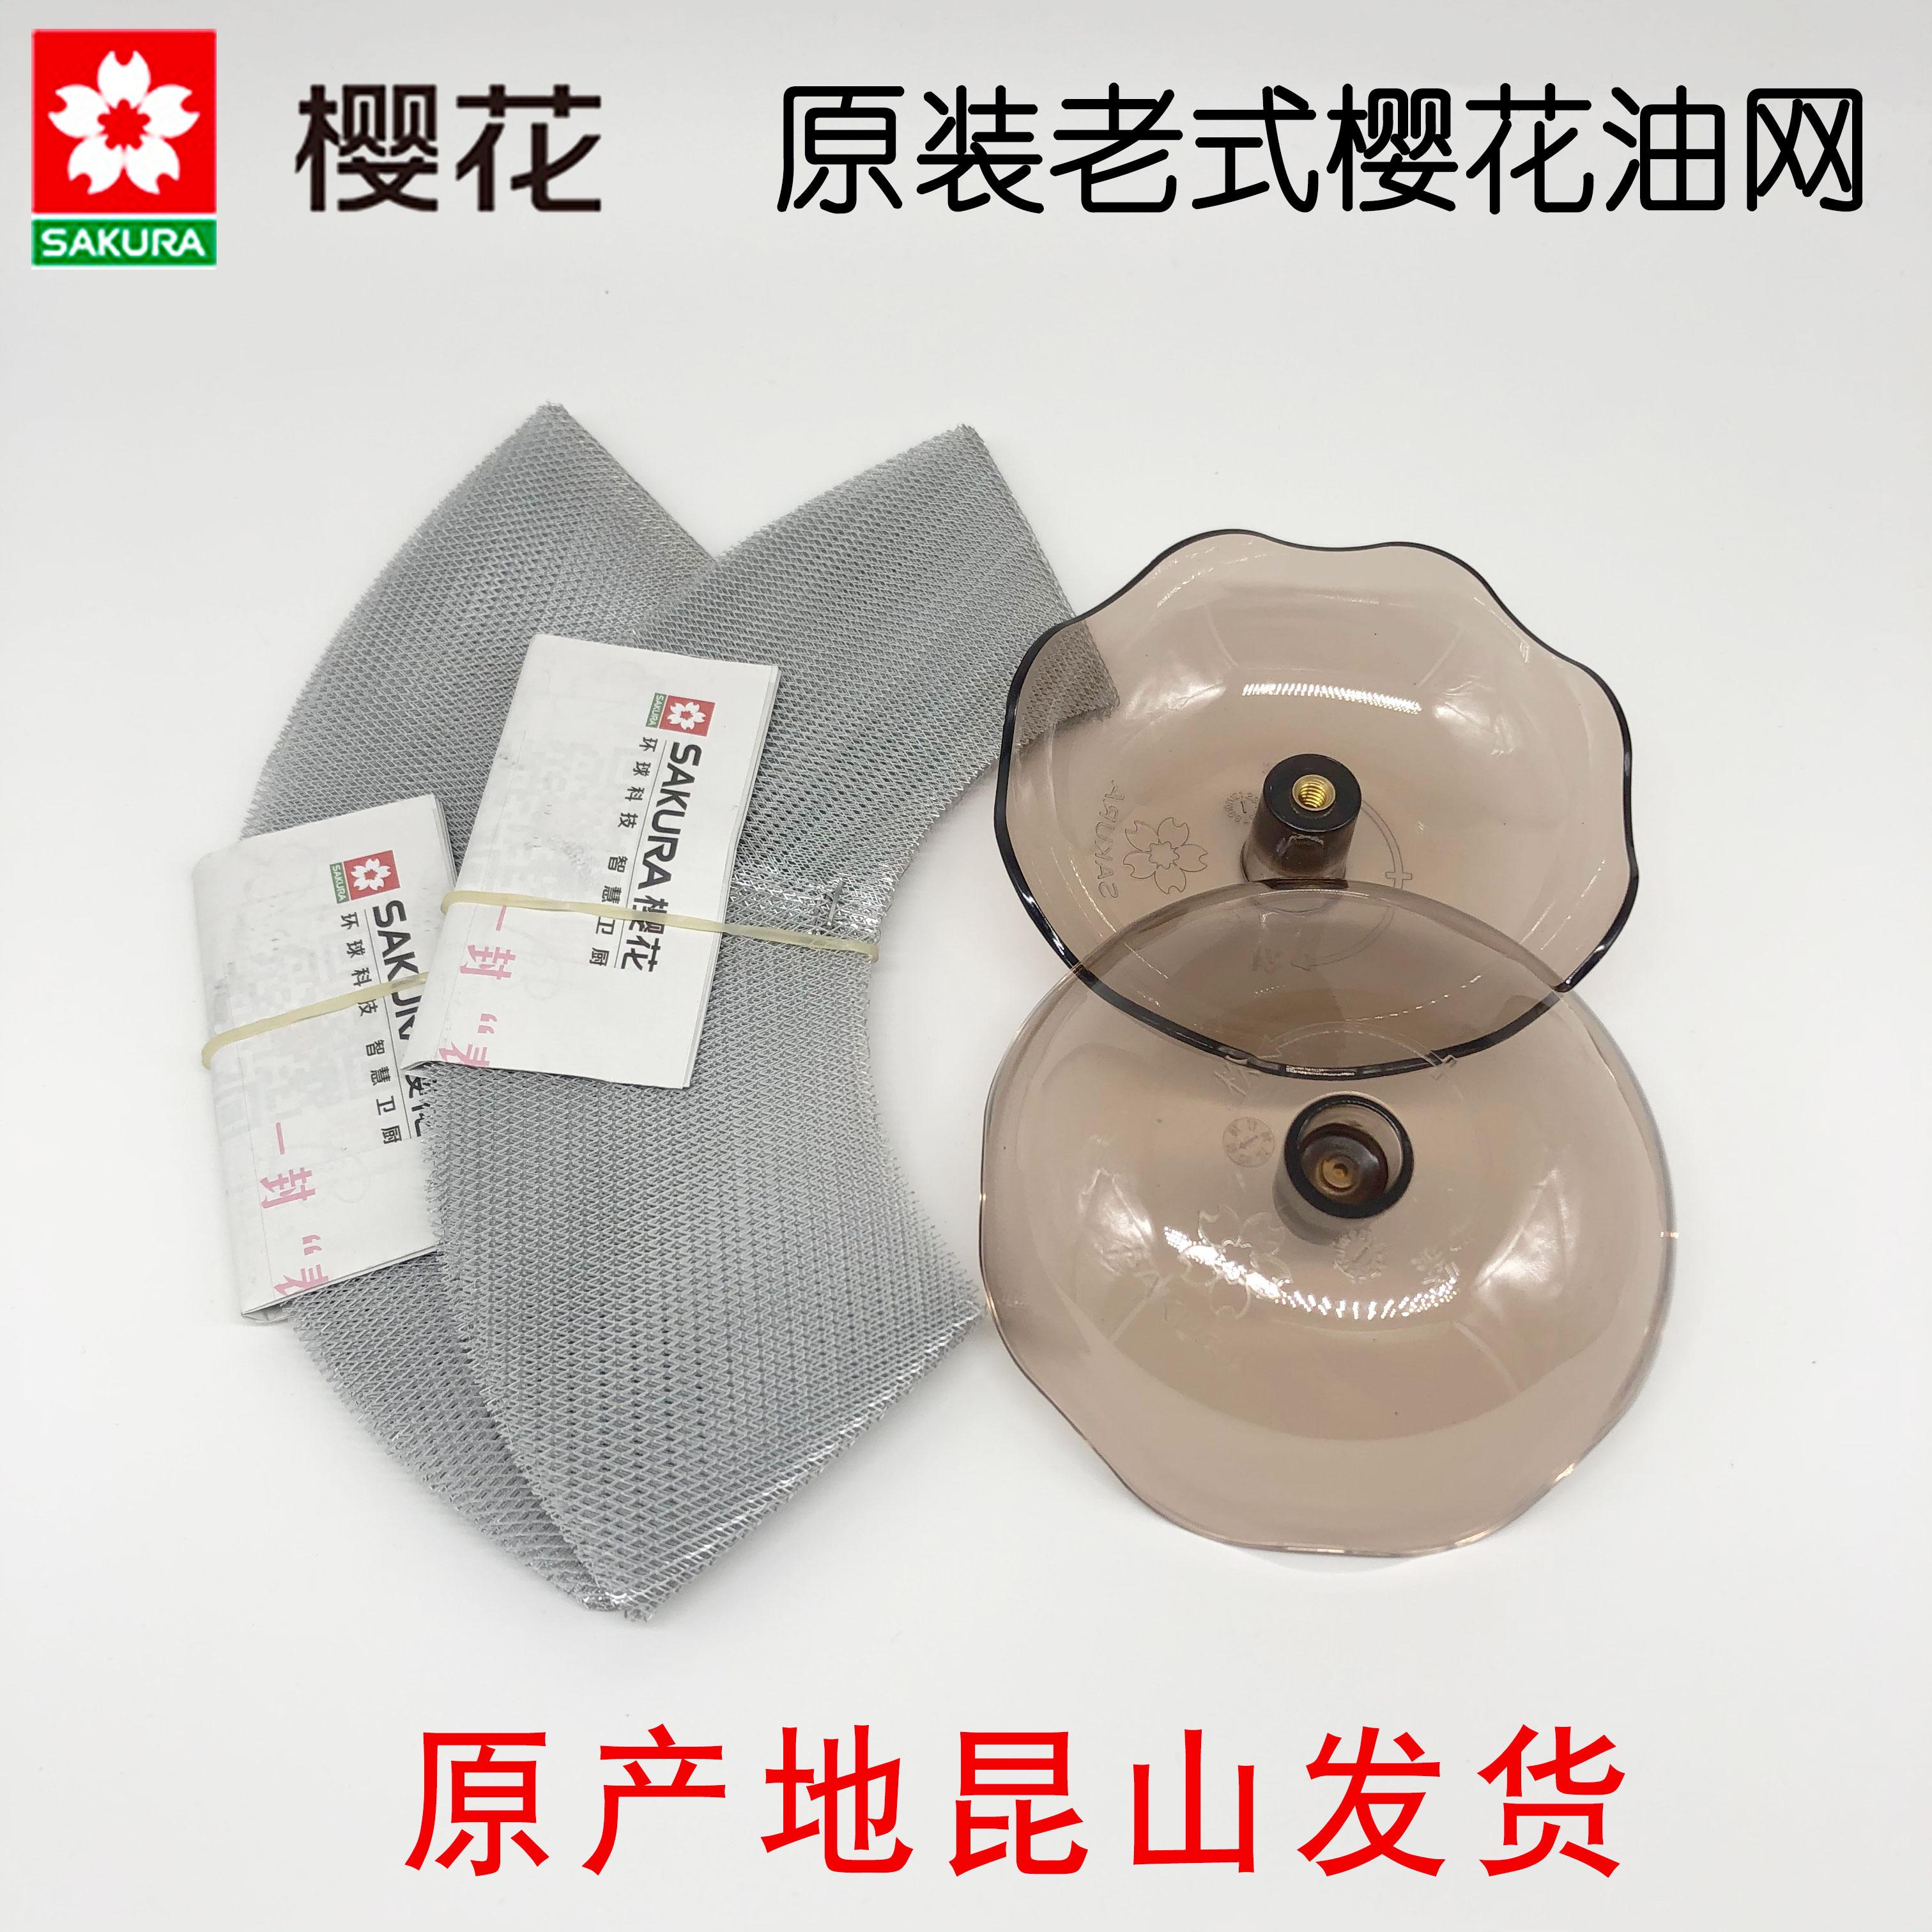 Lushan cherry blossom smoke machine oil mesh off-filter cover hood smoker filter universal original round net accessories